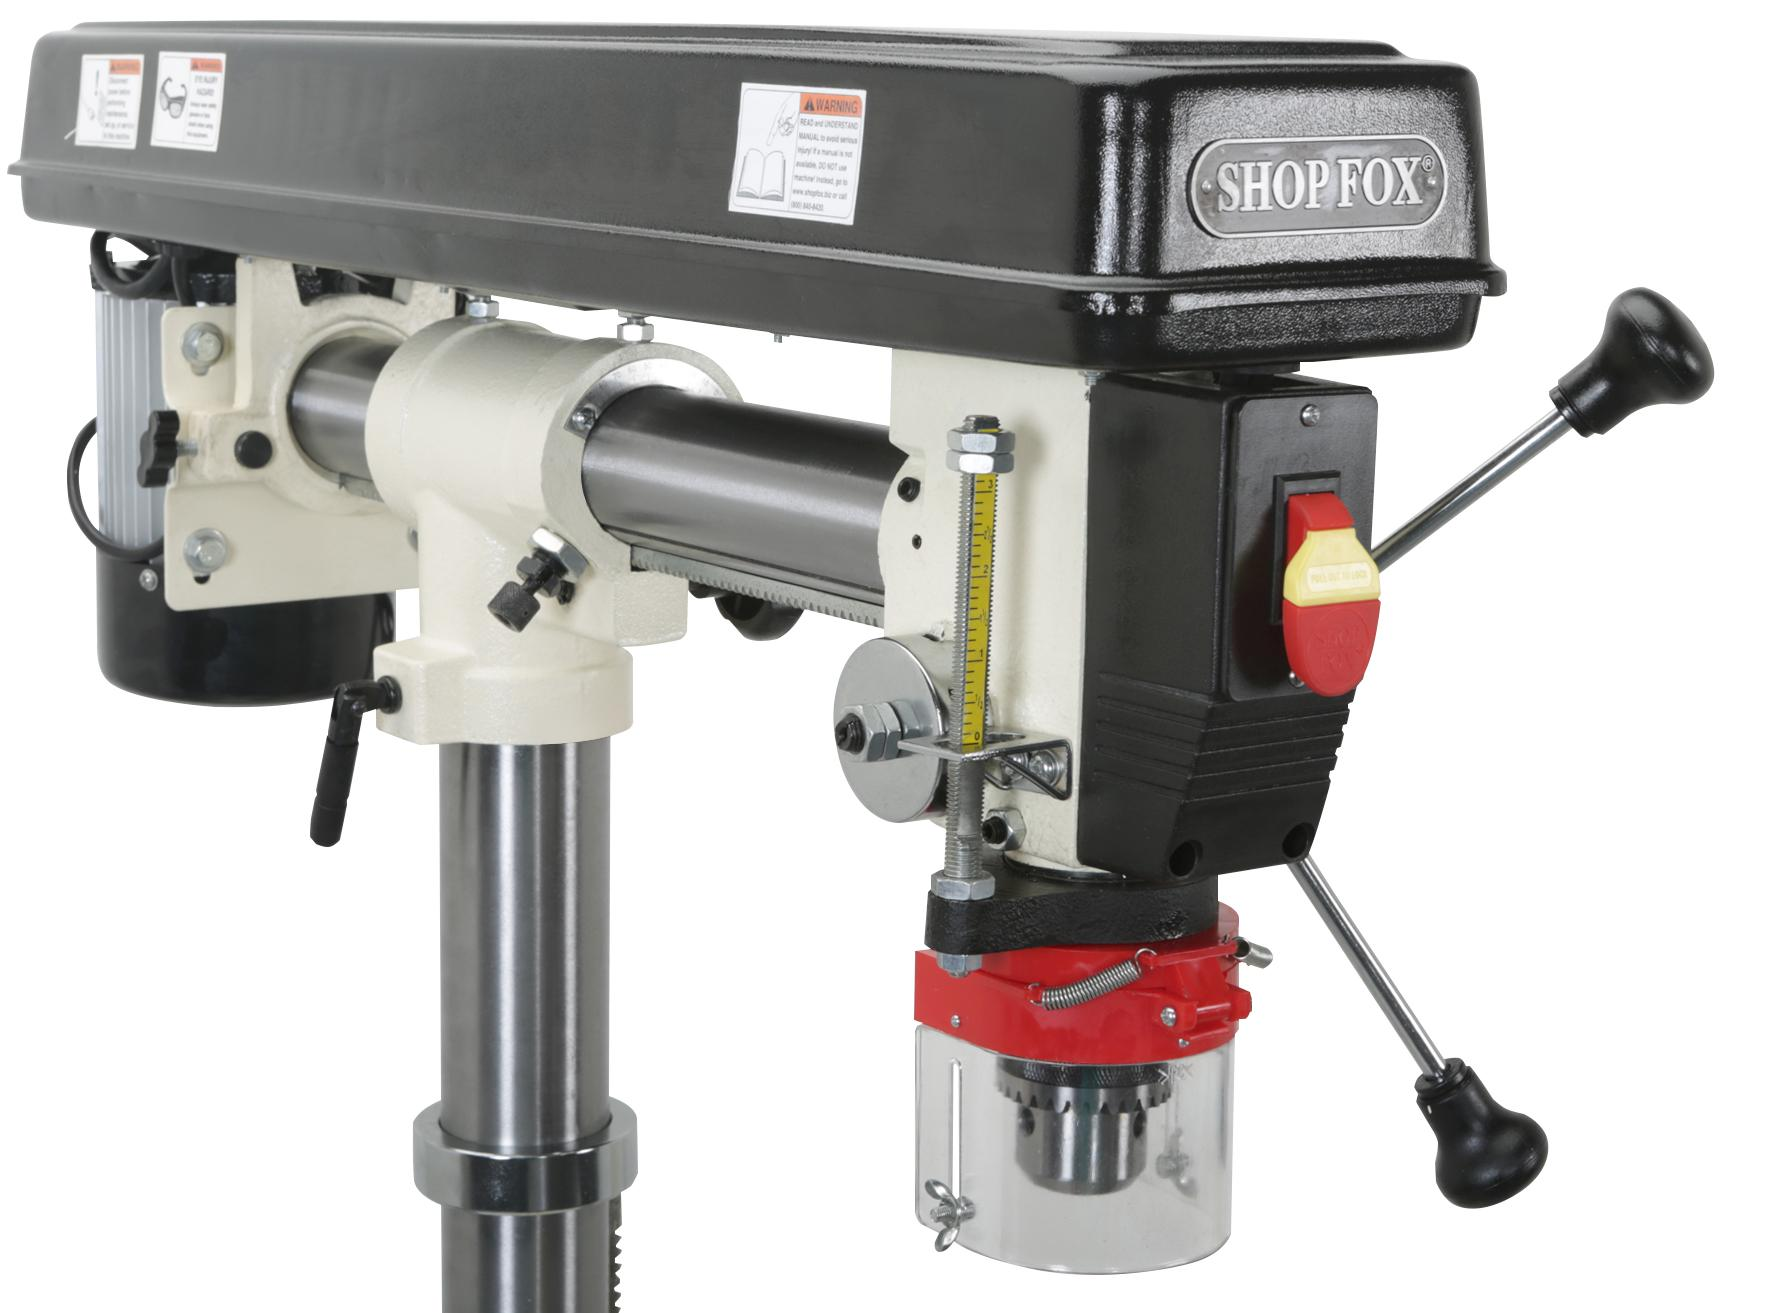 Drill press on Shoppinder